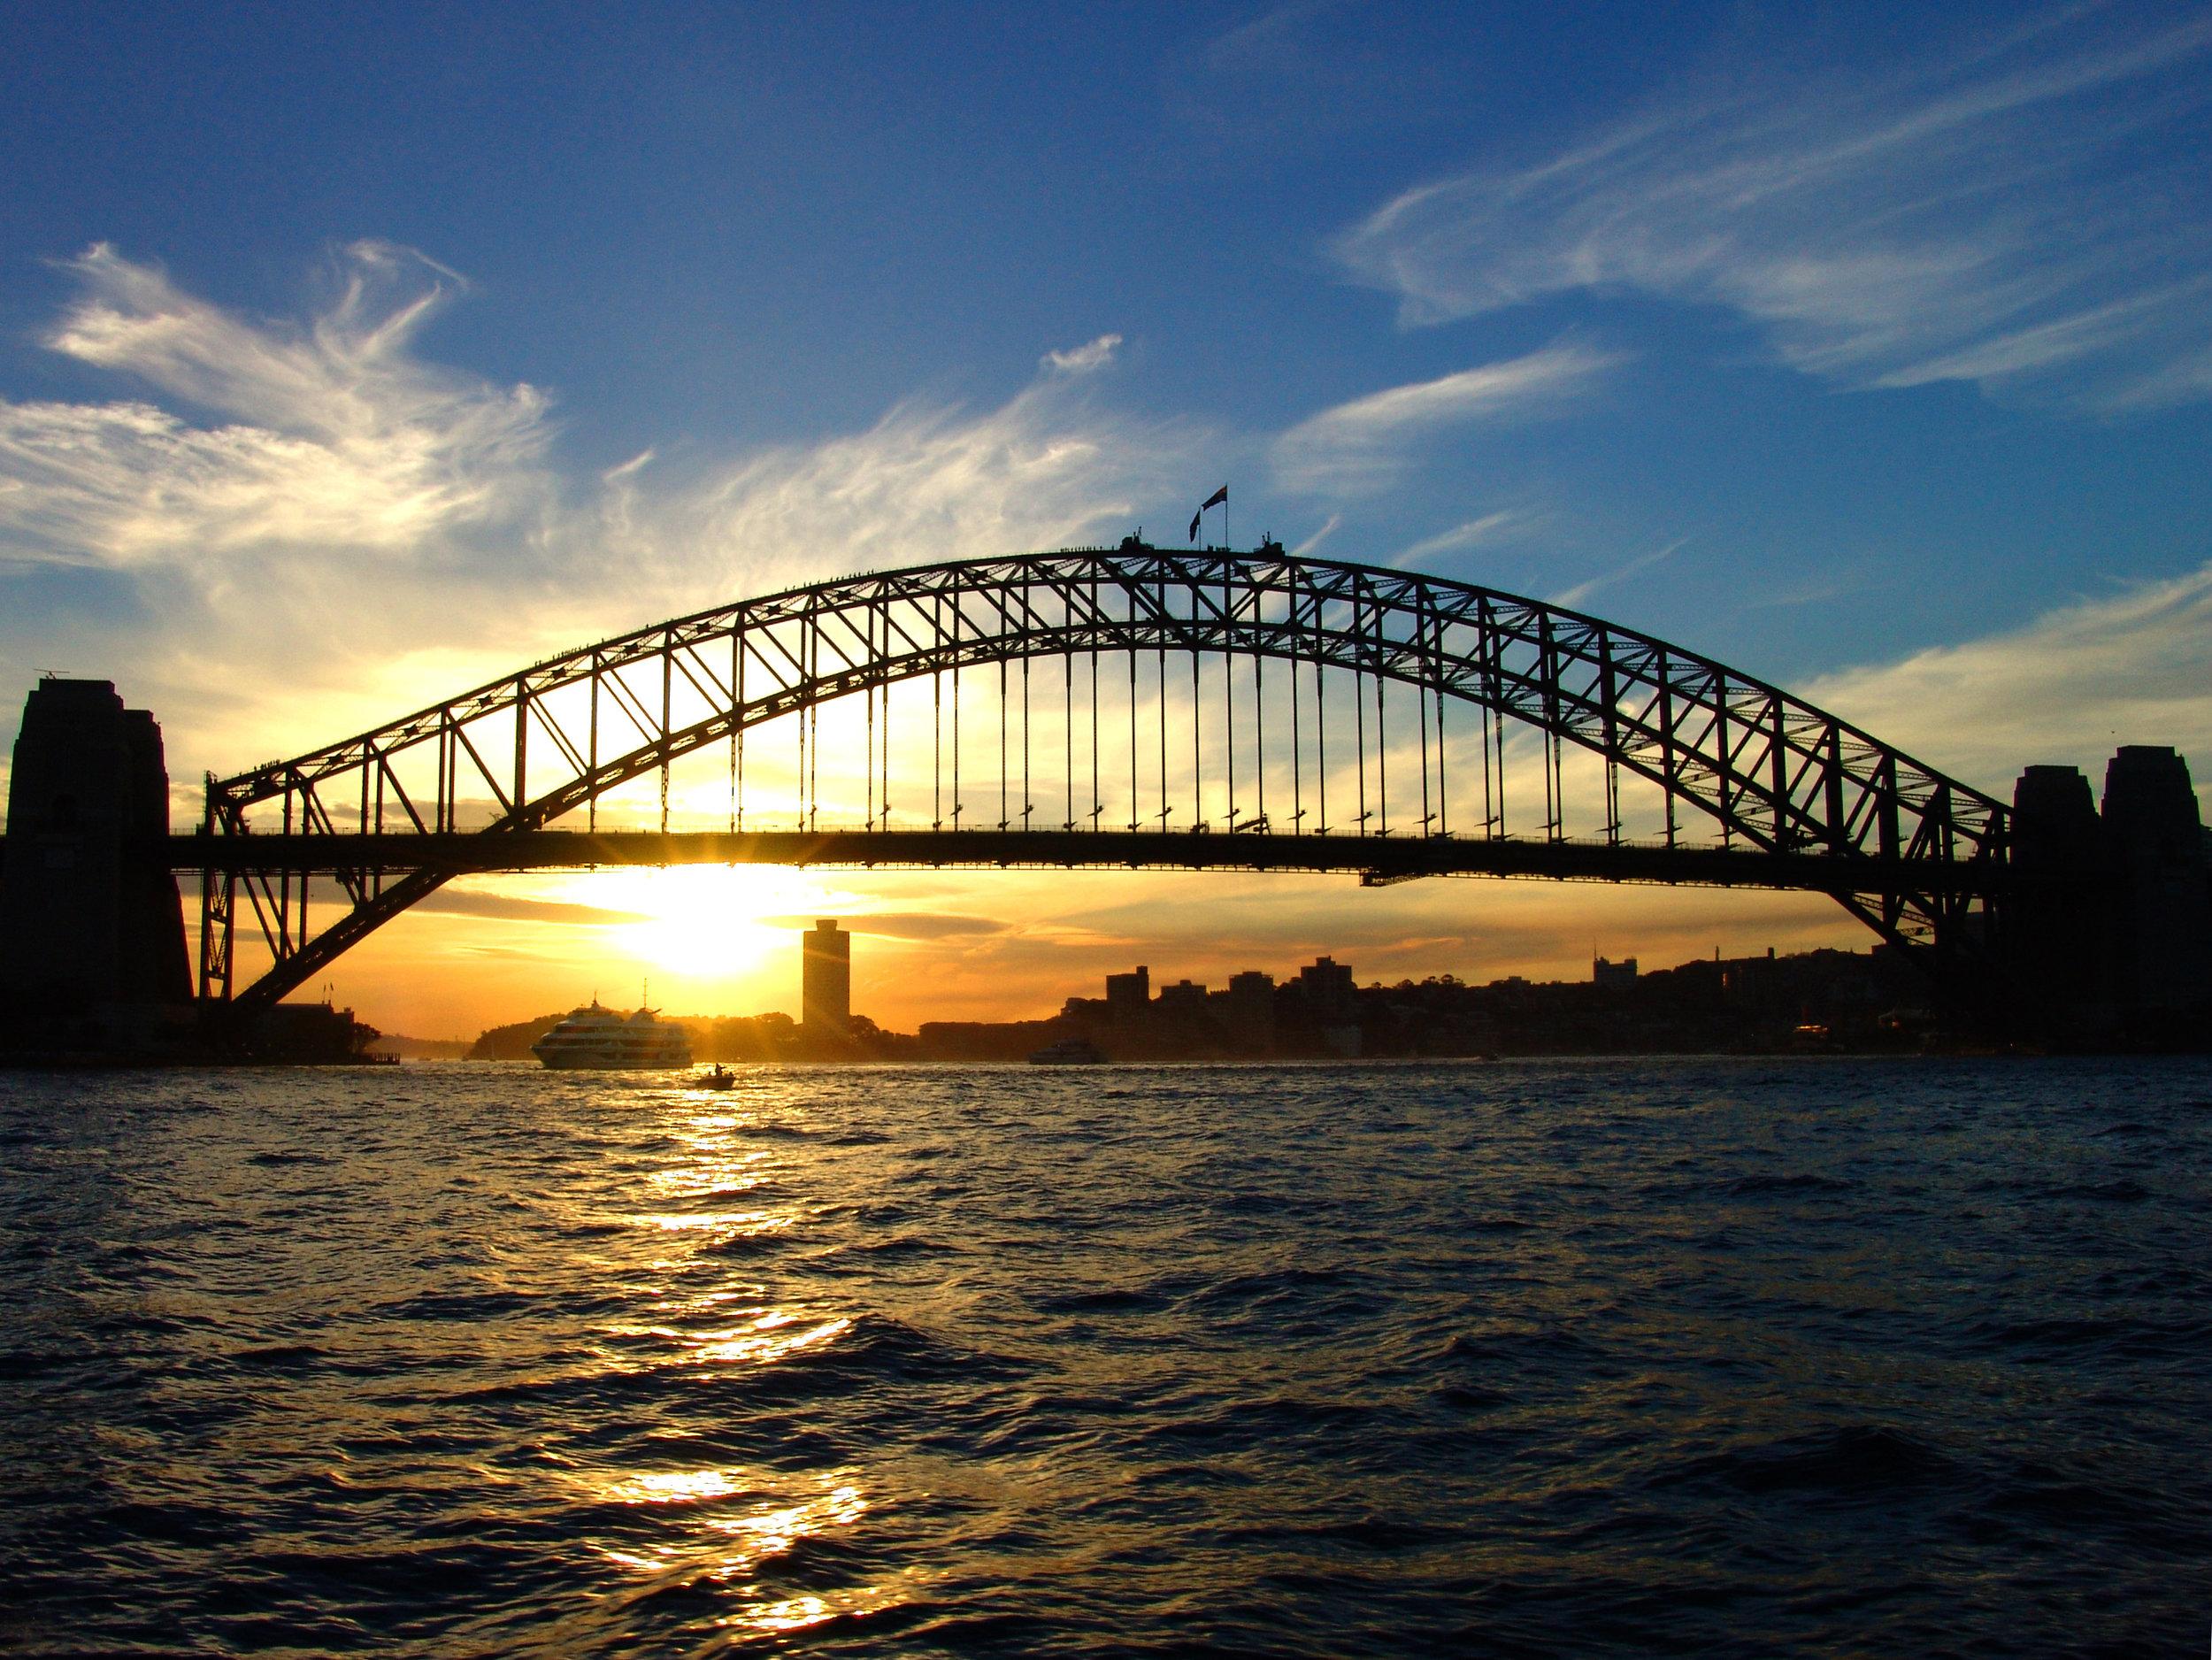 sydney-harbour-bridge-1541507.jpg